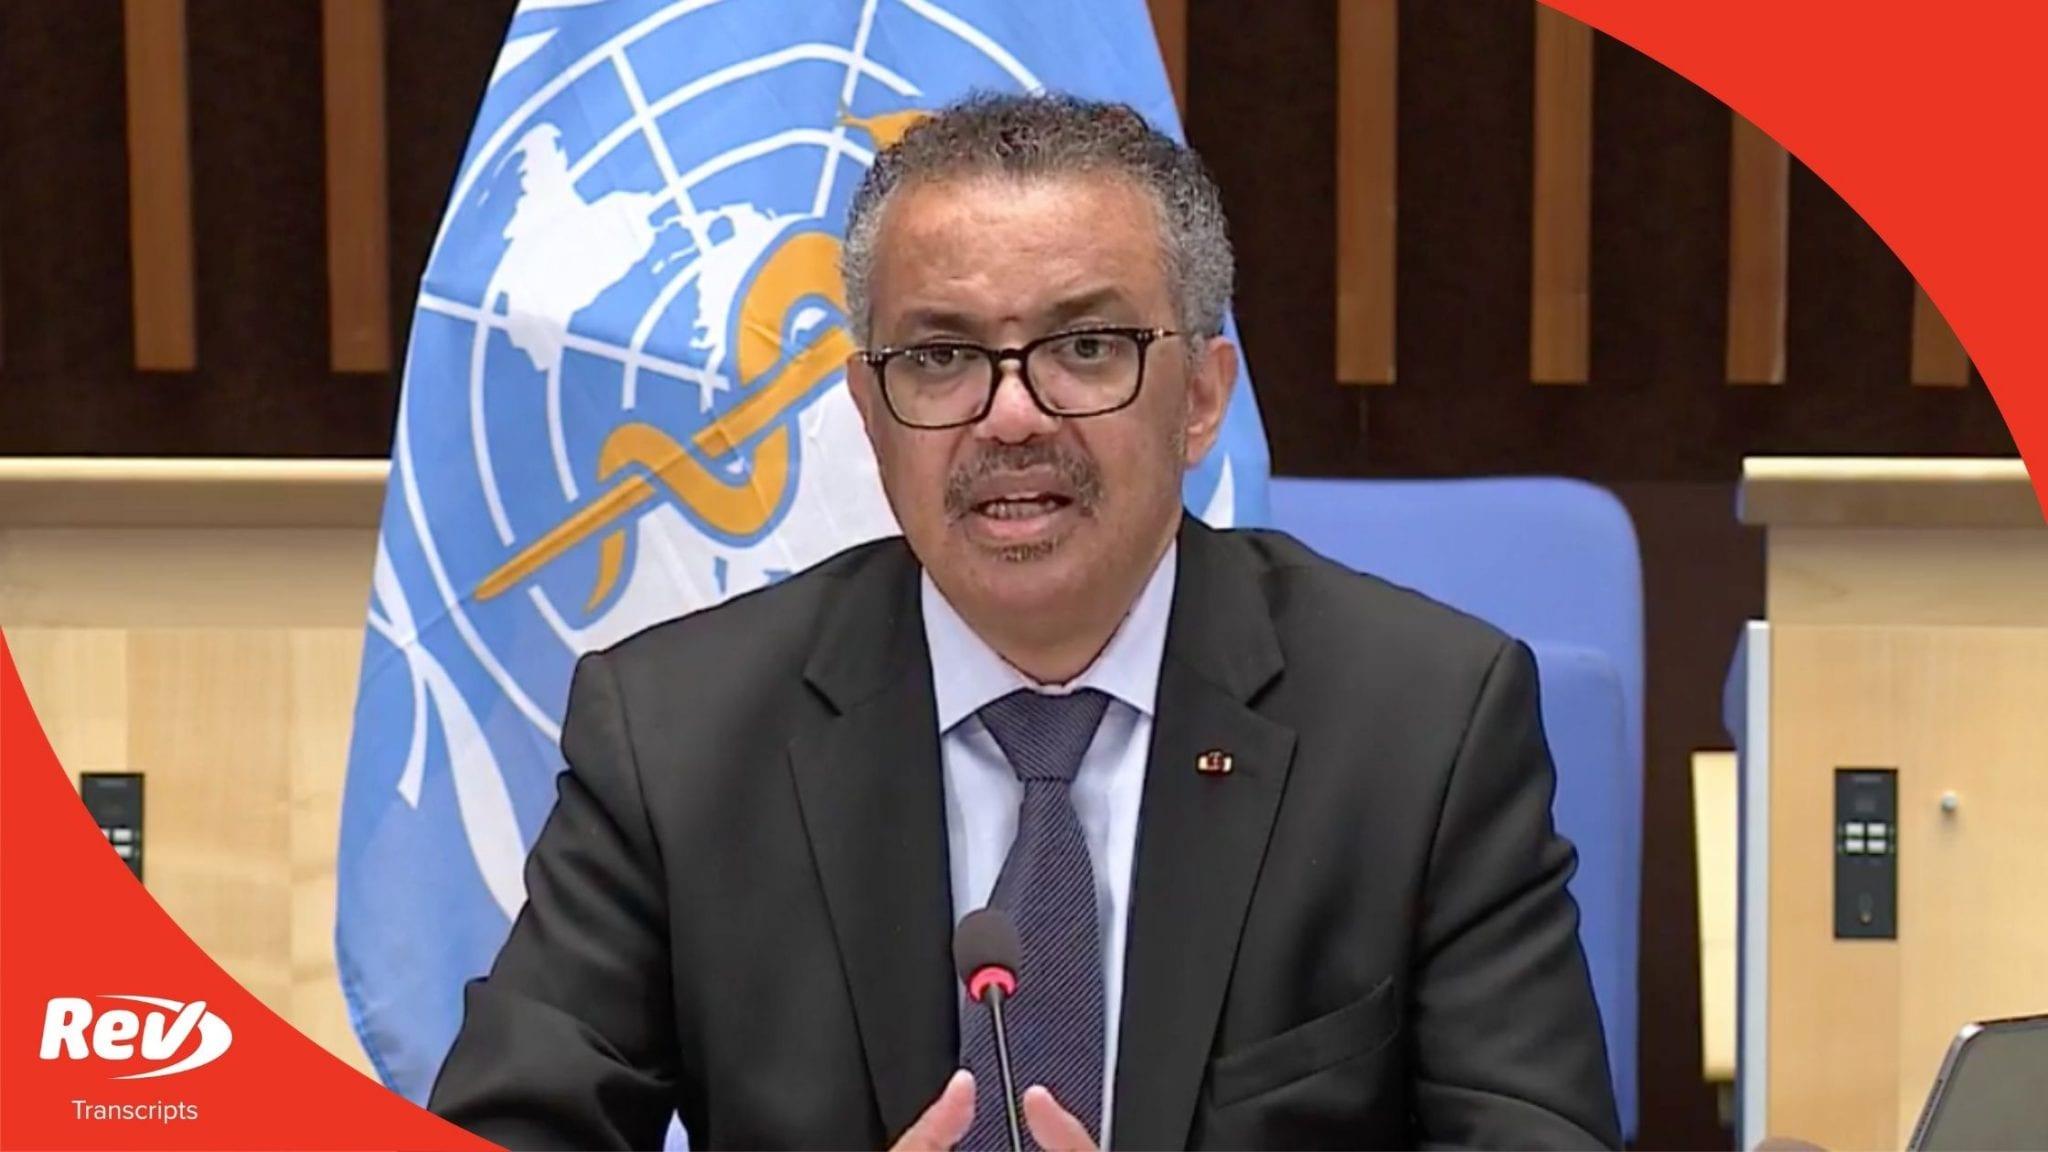 World Health Organization (WHO) Coronavirus Press Briefing Transcript August 13